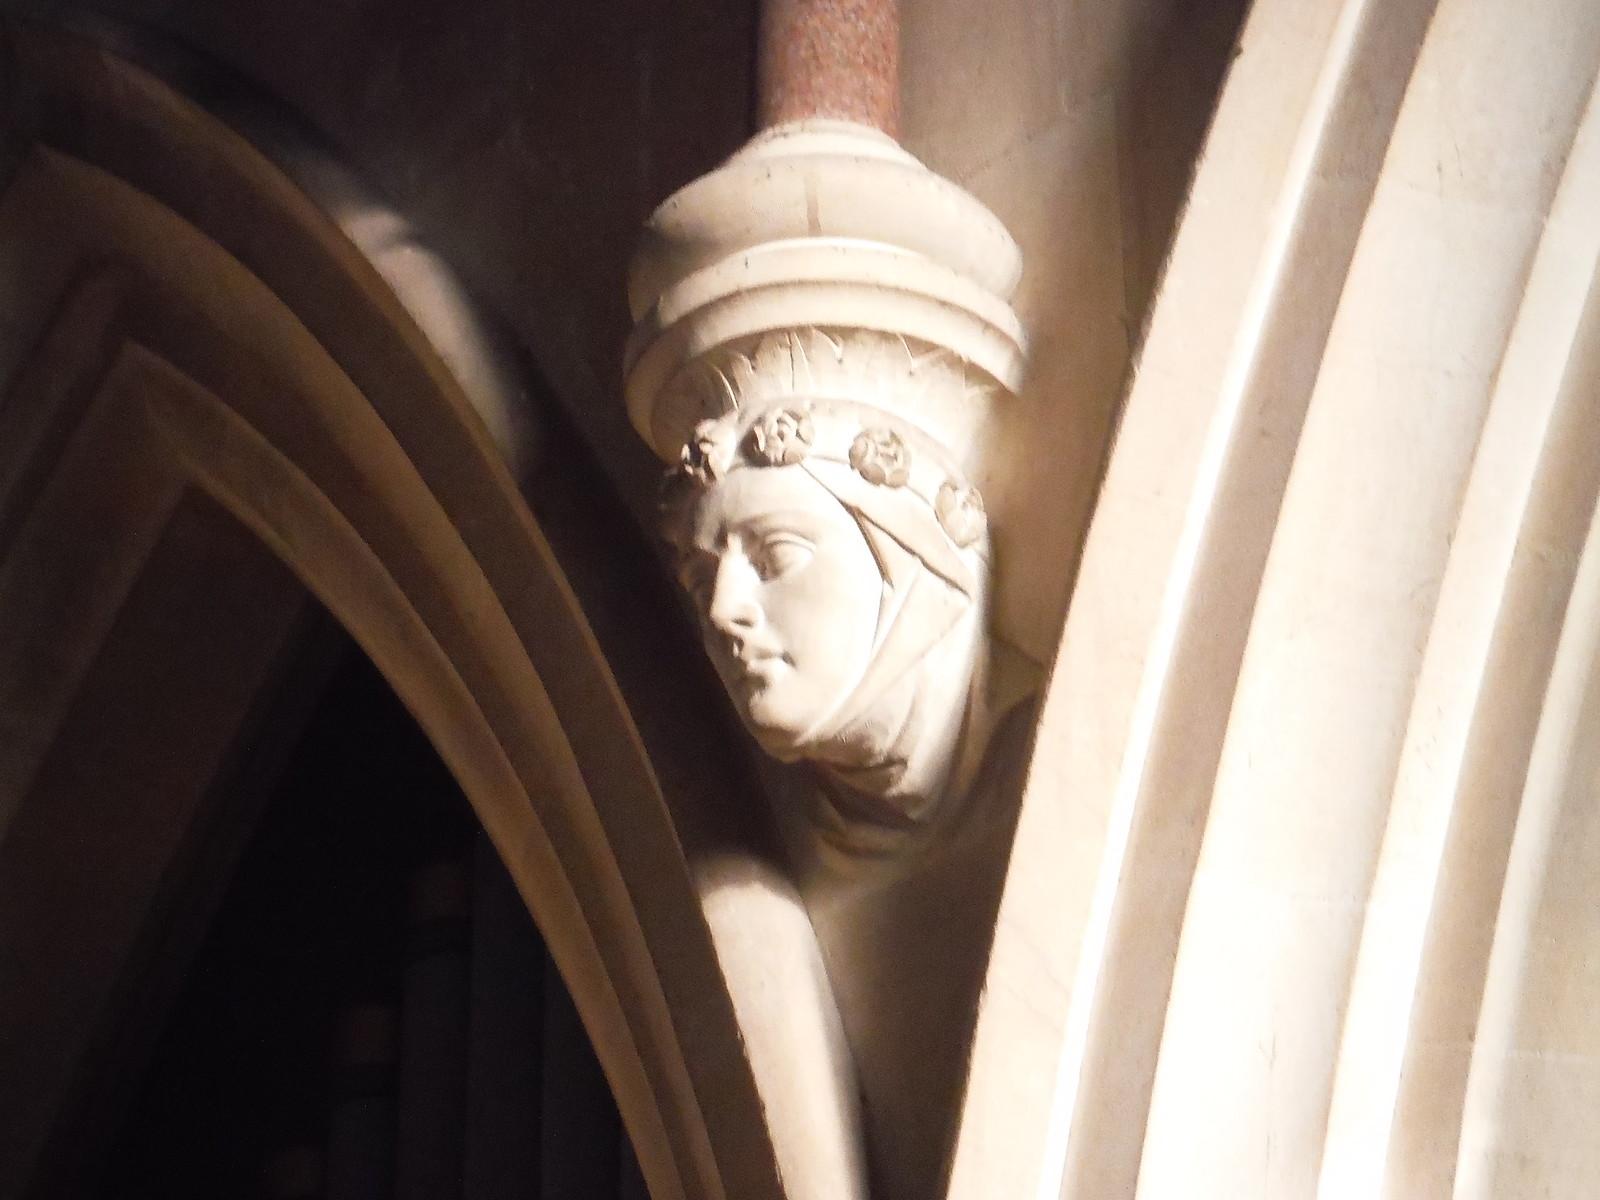 Corbel in St. Matthew's, Midgham SWC Walk 117 Aldermaston to Woolhampton (via Stanford Dingley)